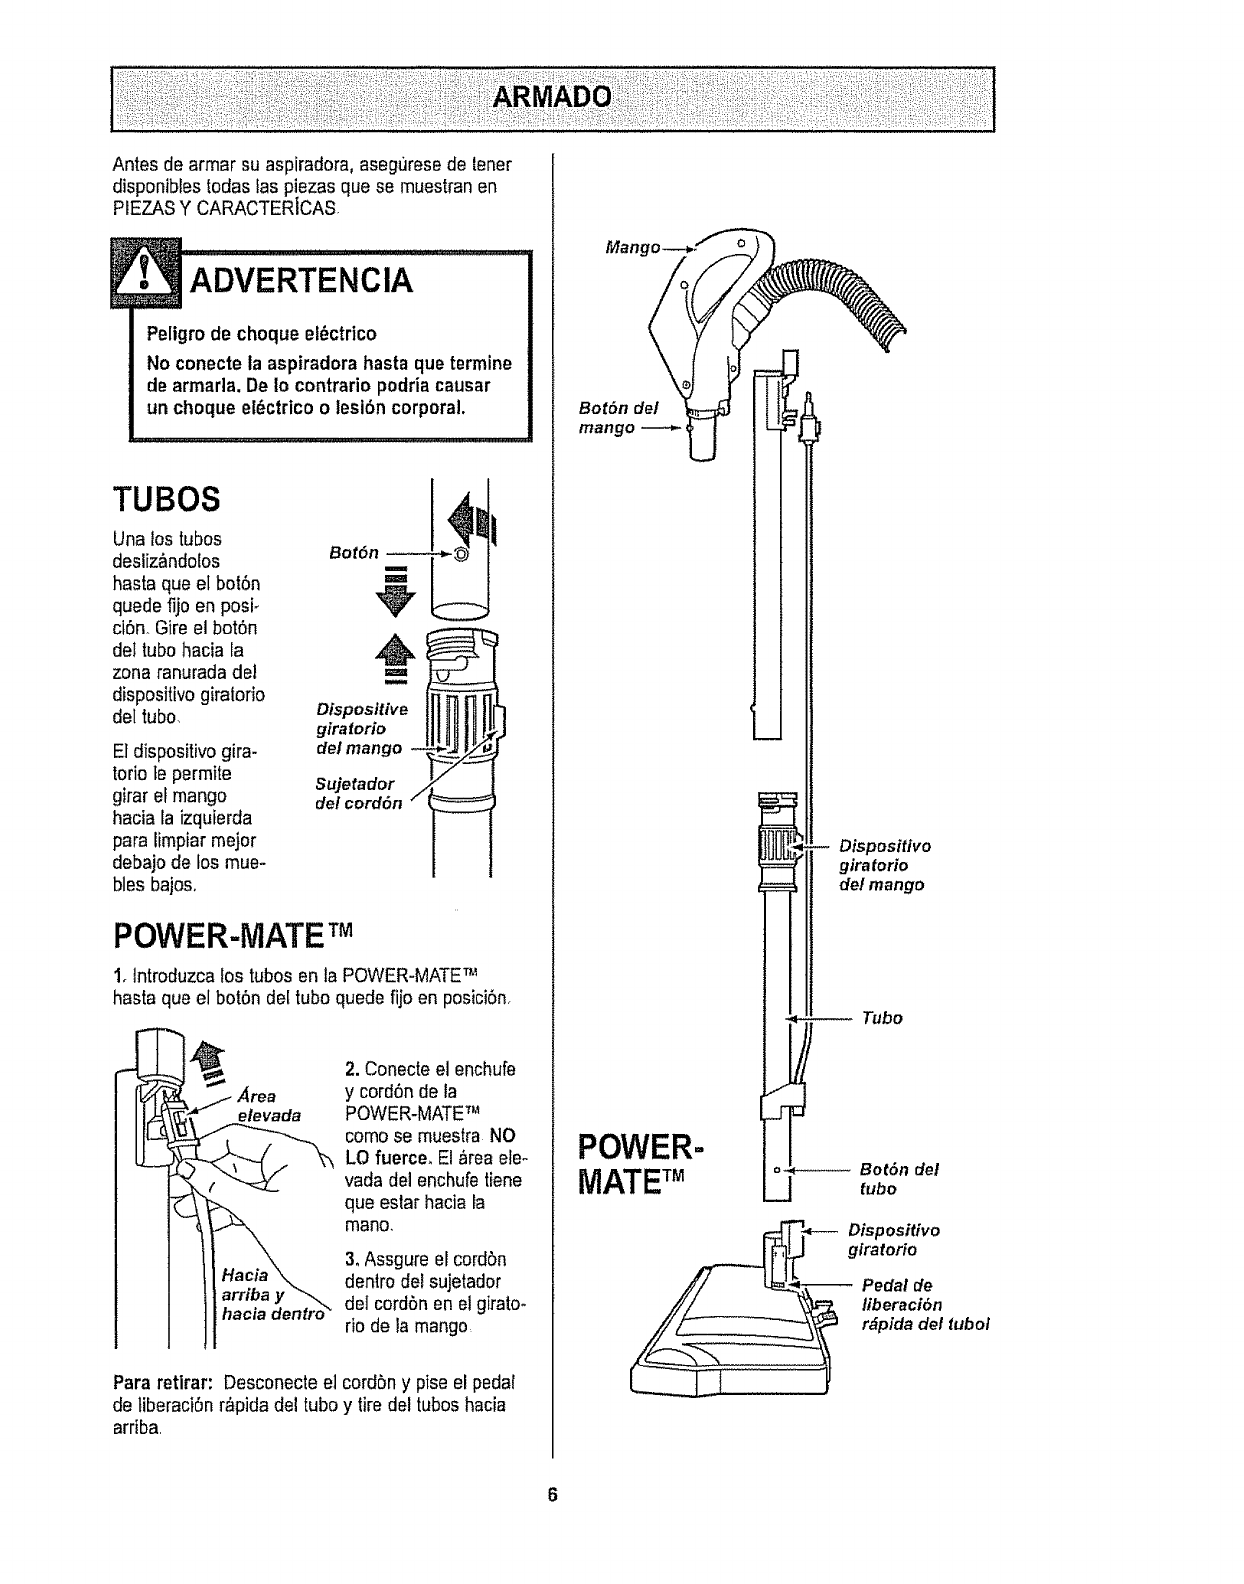 Kenmore 11626412690 User Manual Vacuum Cleaner Manuals And Guides Vada Fuse Box Antes De Armar Su Aspiradora Aseguresede Tener